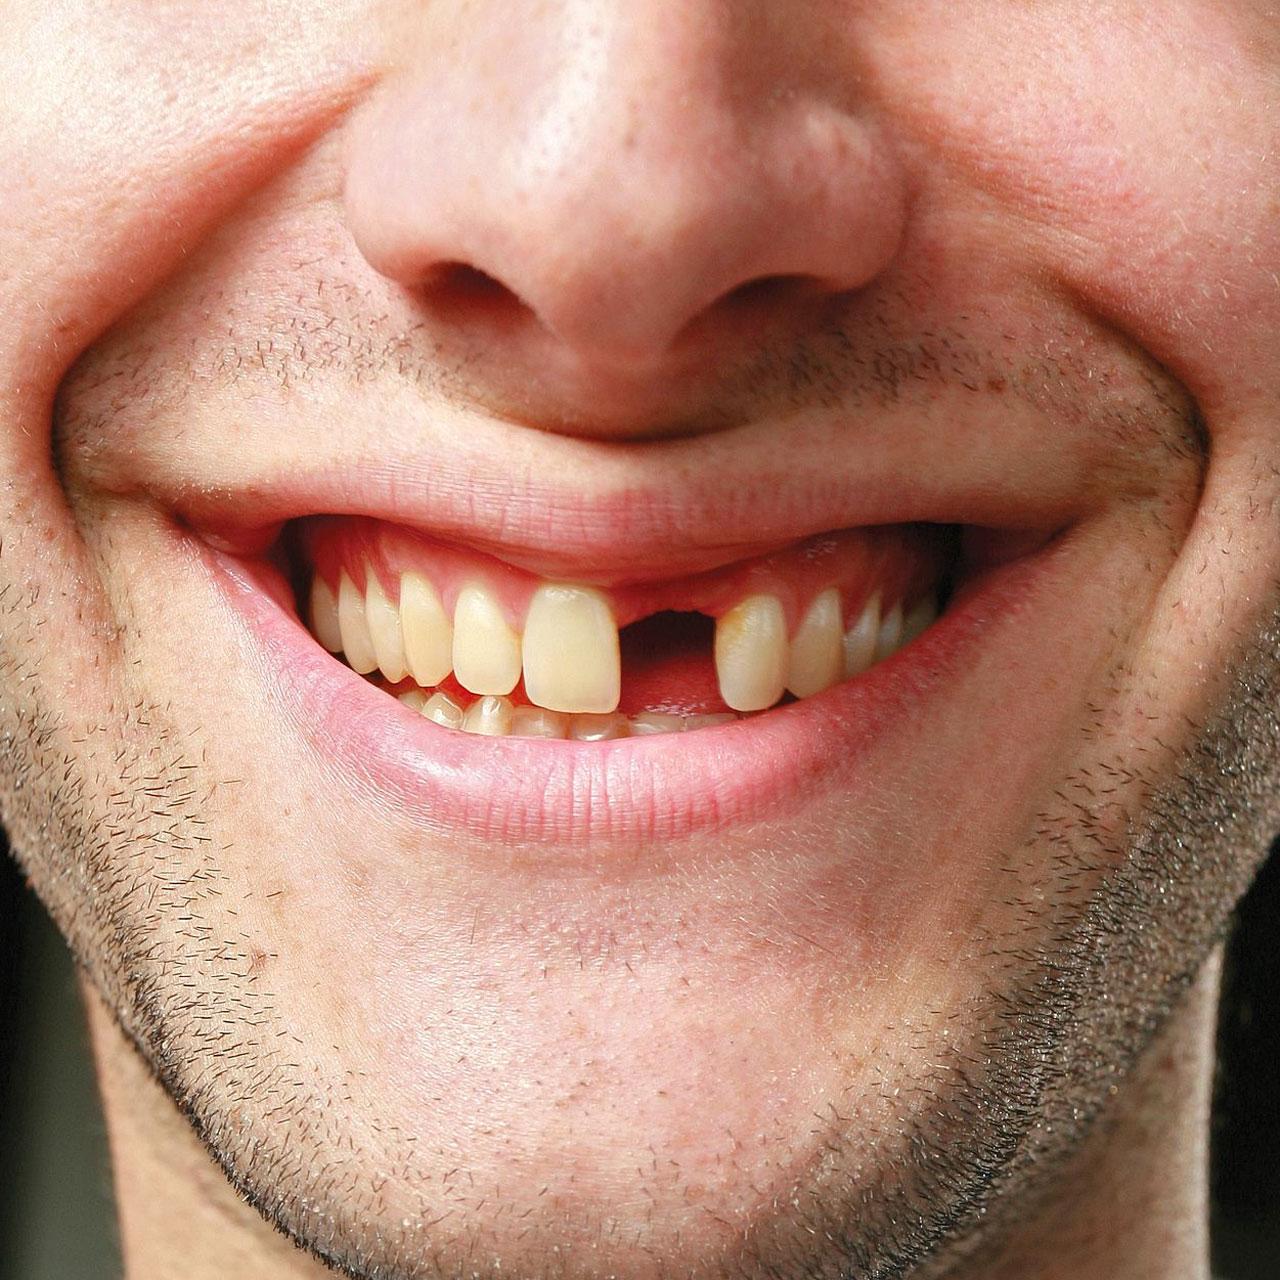 NHL's Daniel Sedin, Jaromir Jagr and NBA's Goran Dragic, Dennis Schroder lose teeth